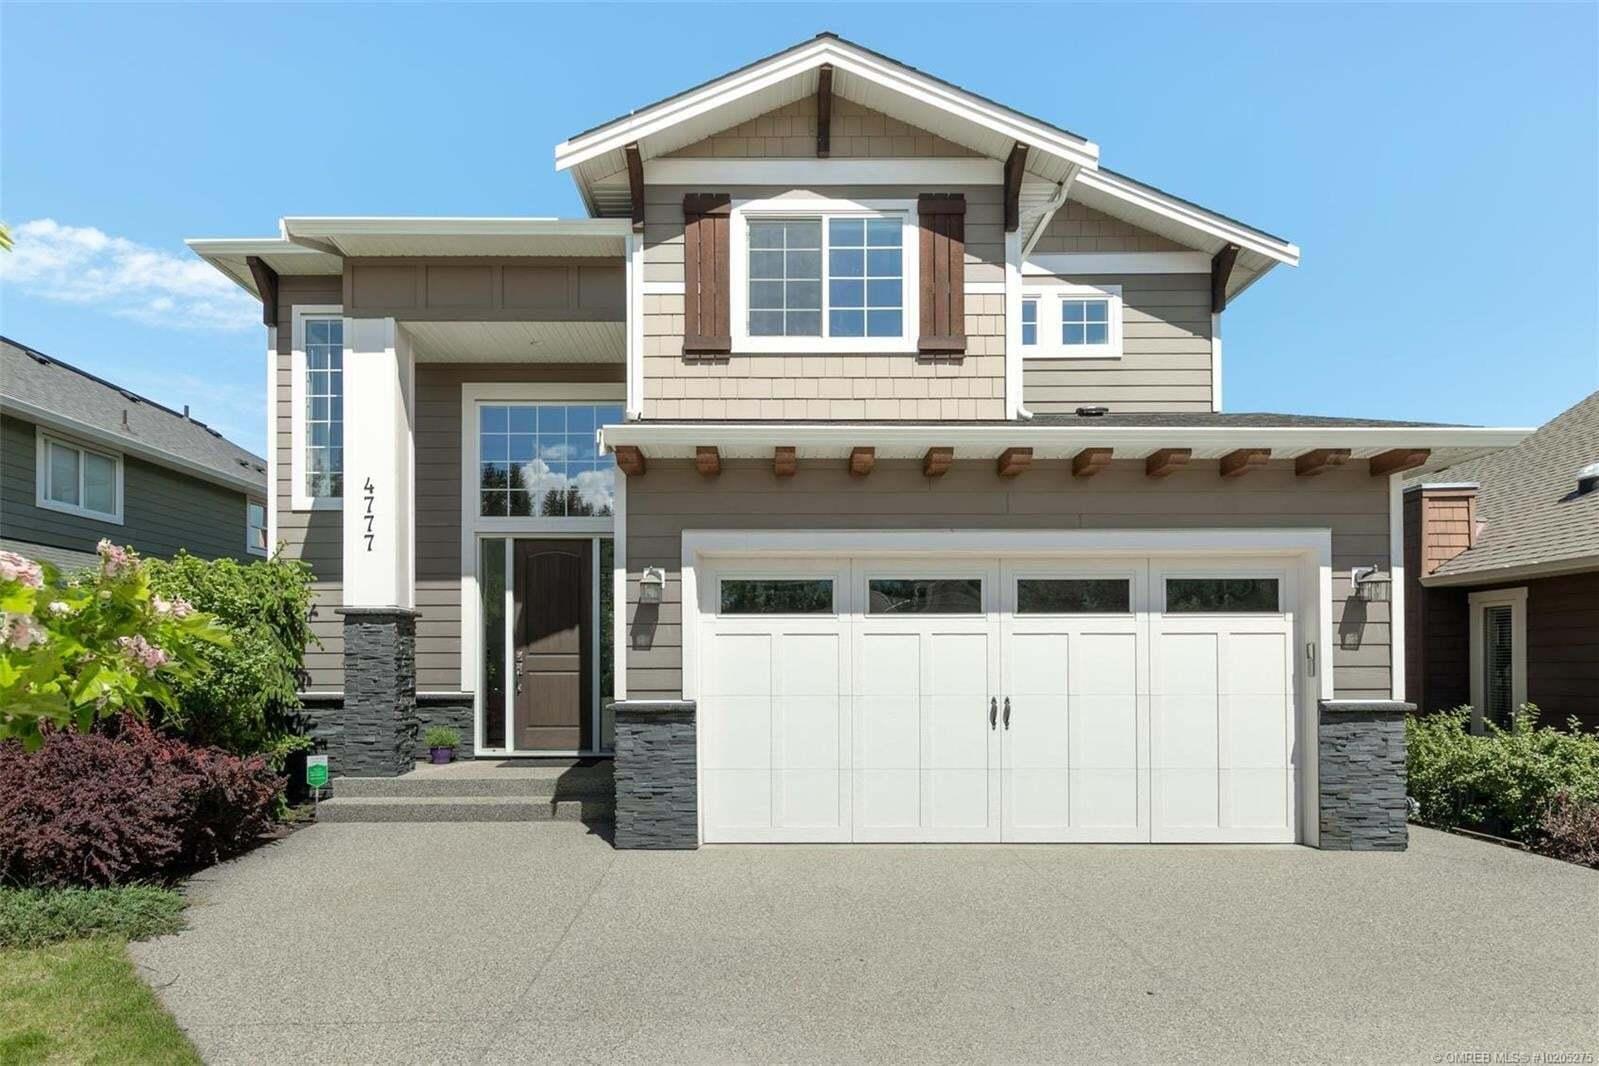 House for sale at 4777 Dillon Pl Kelowna British Columbia - MLS: 10205275